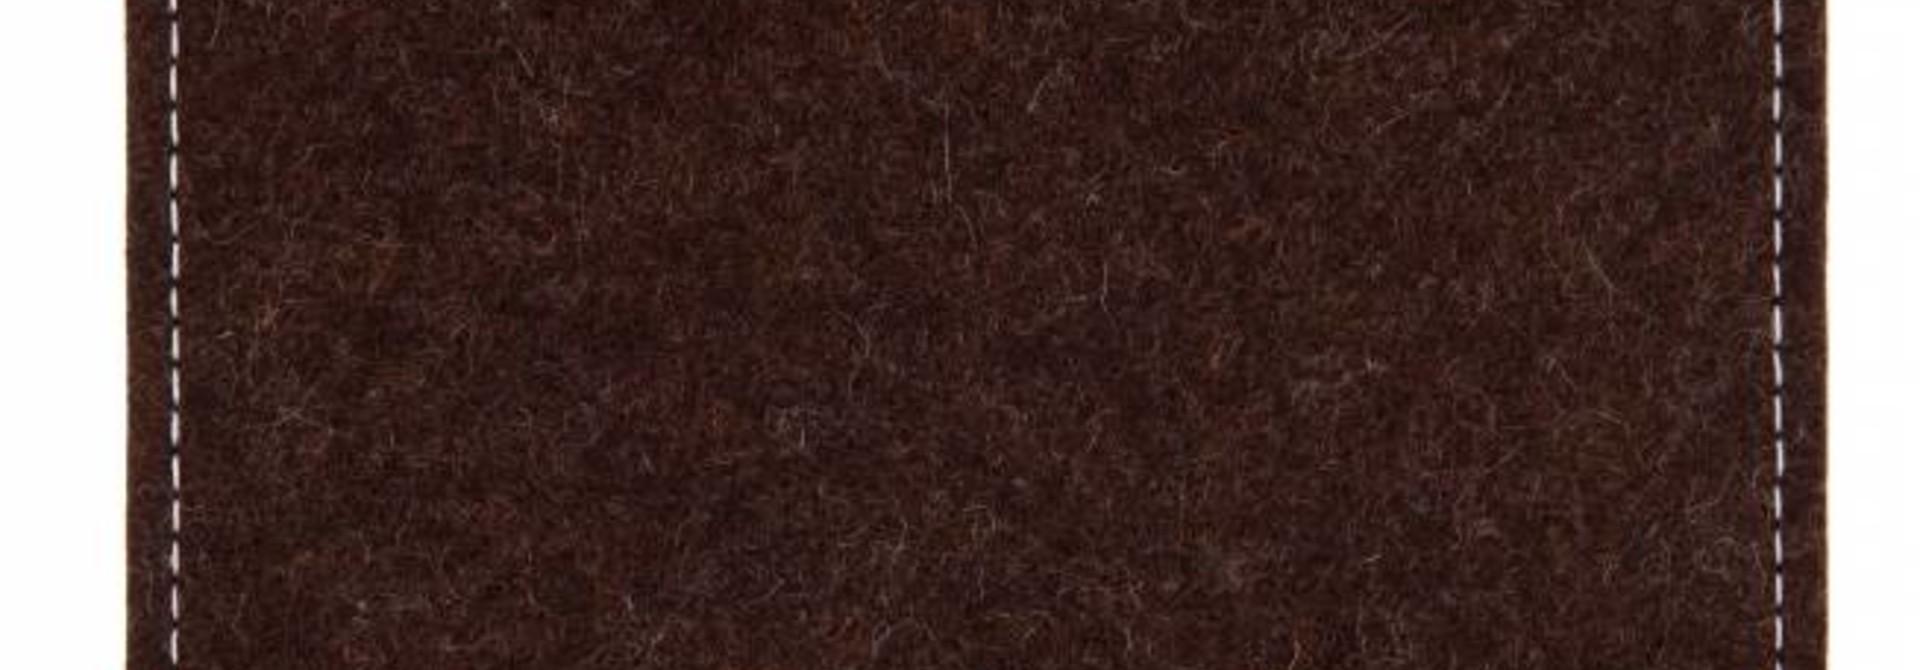 Magic Trackpad Sleeve Truffle-Brown